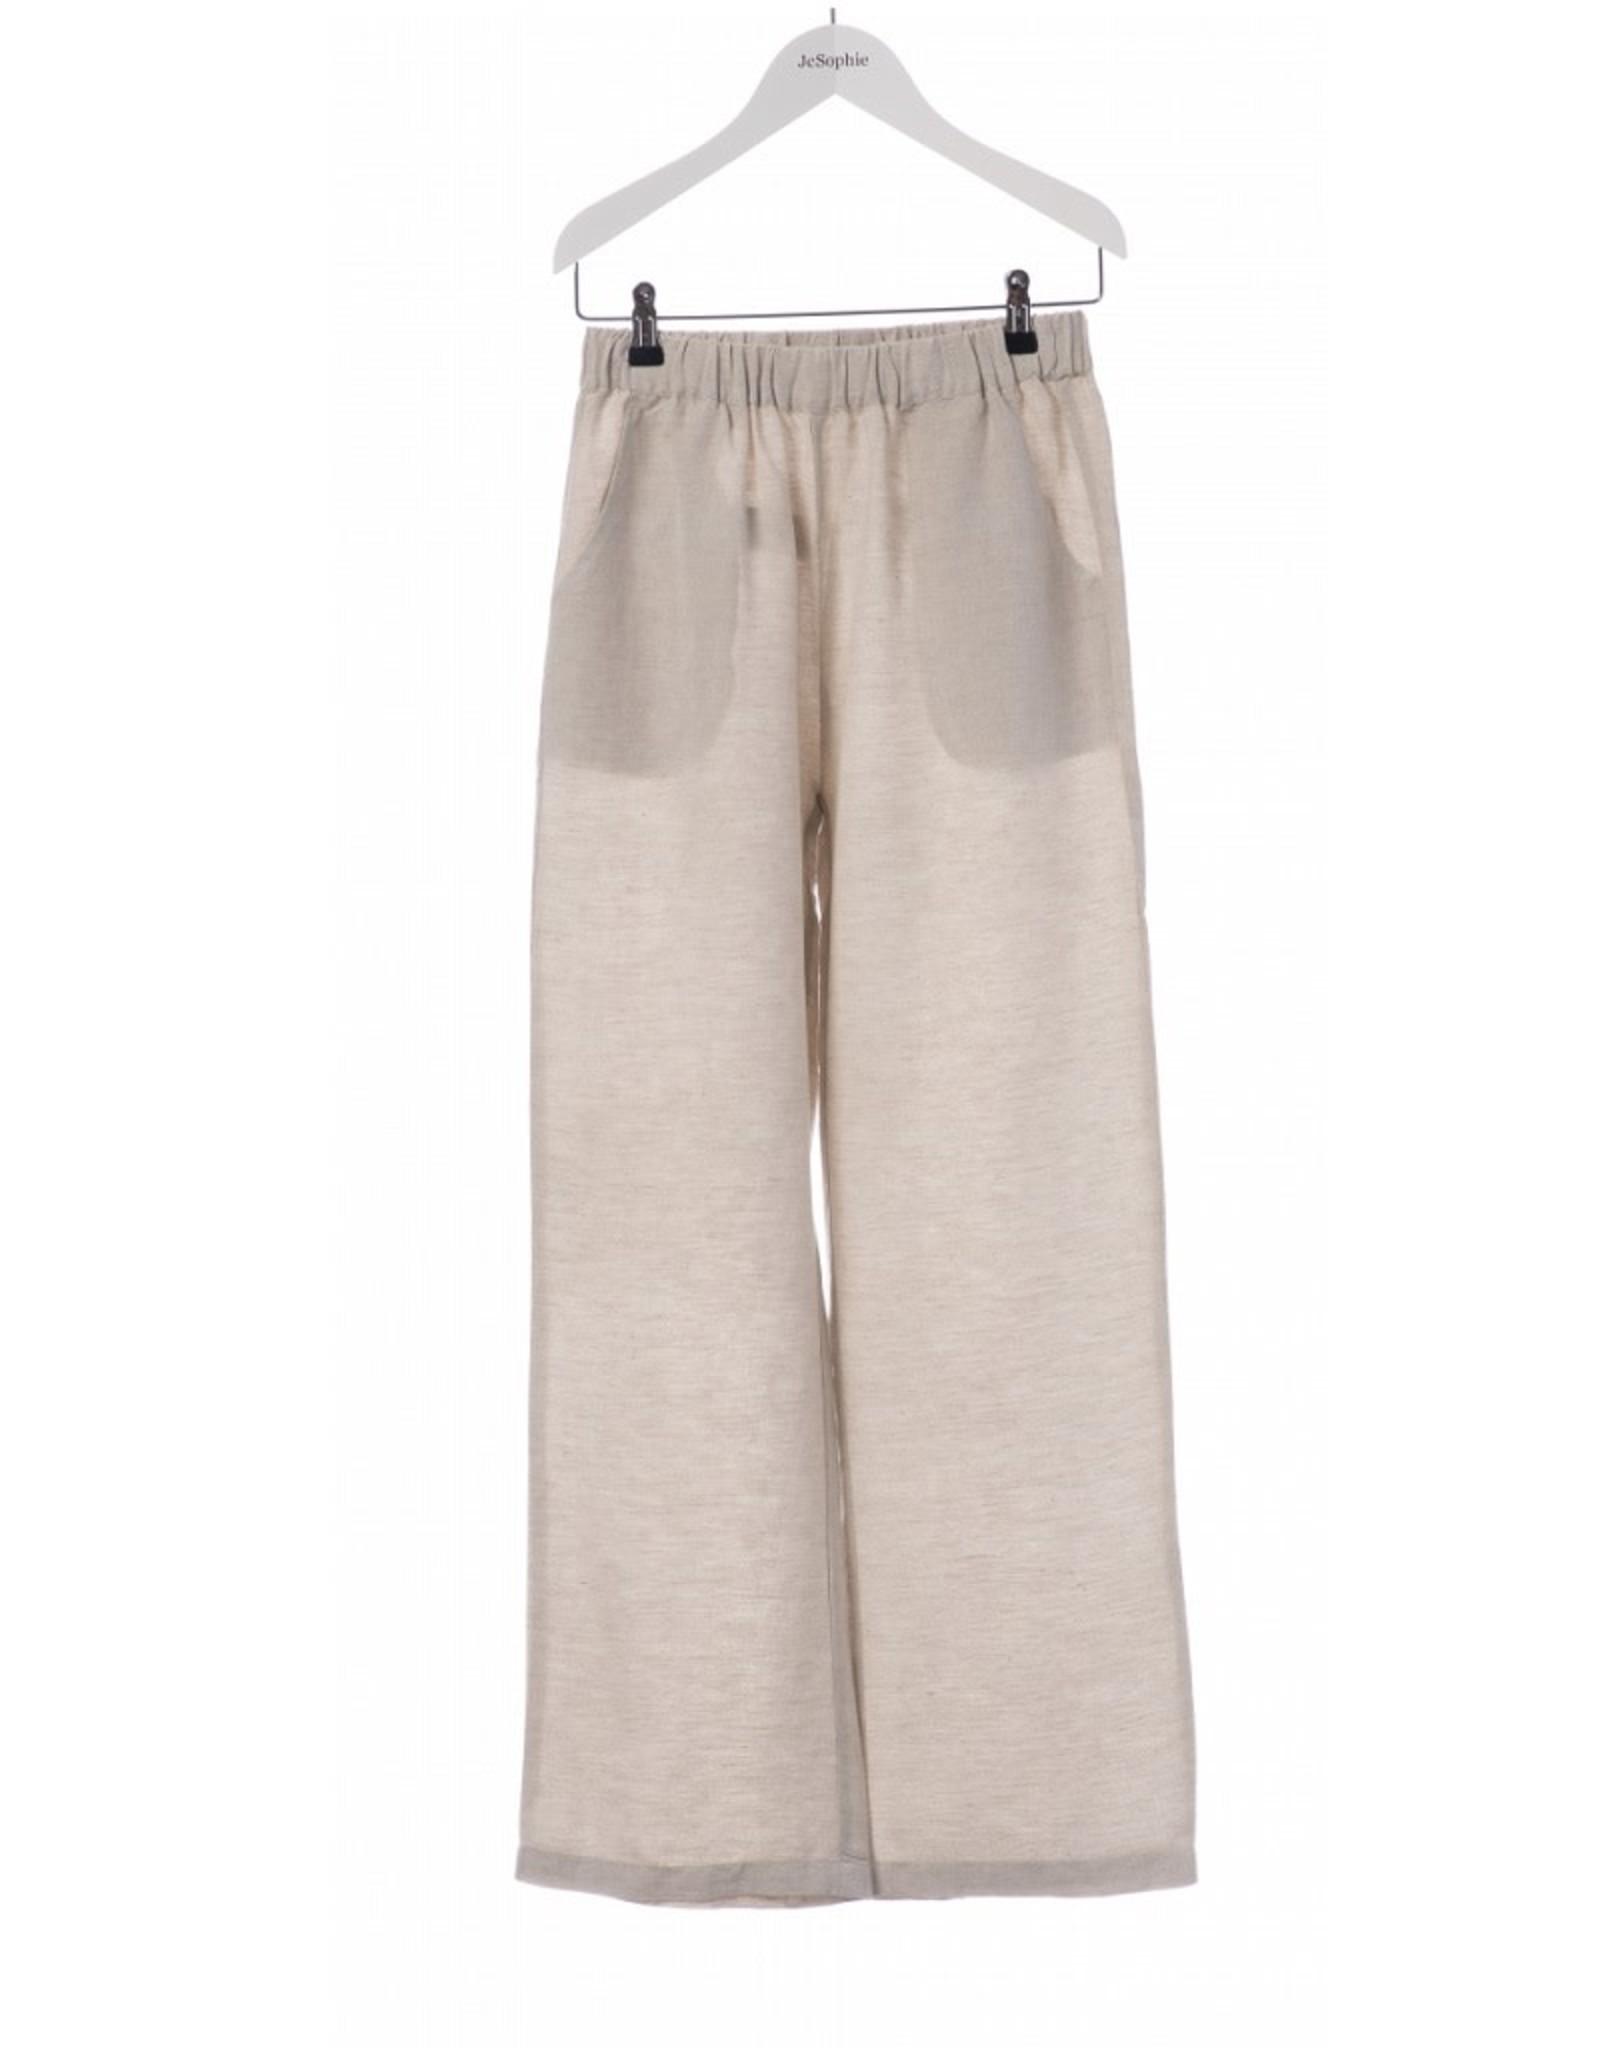 JcSophie JcSophie Garance trousers Light beige